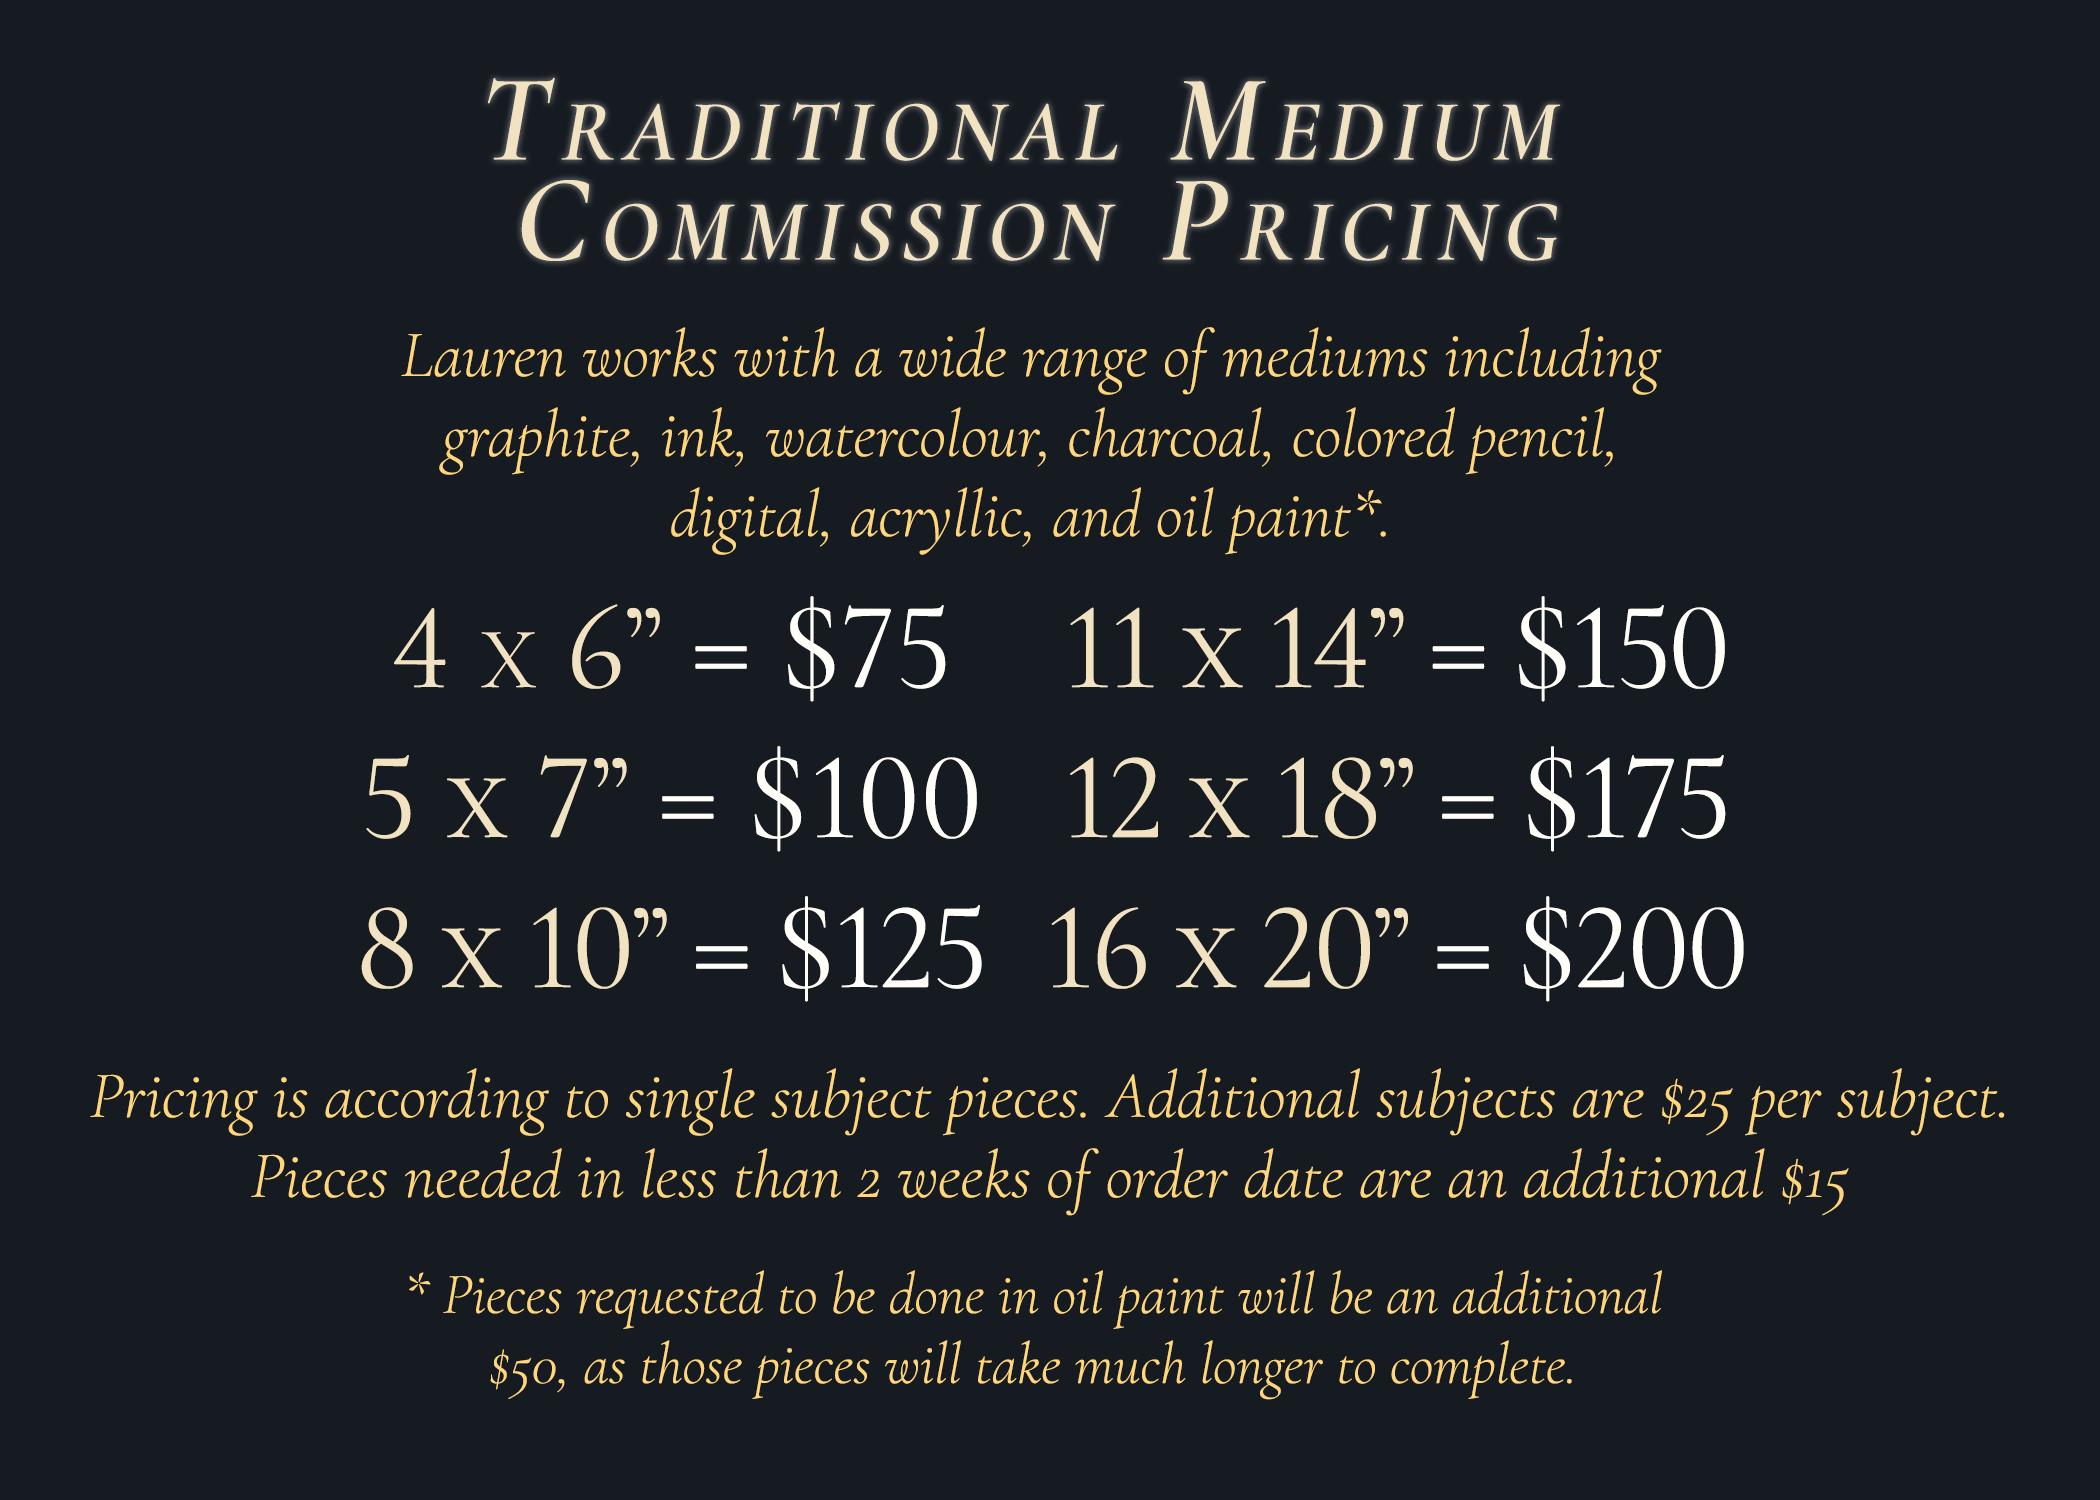 Traditional Medium Pricing